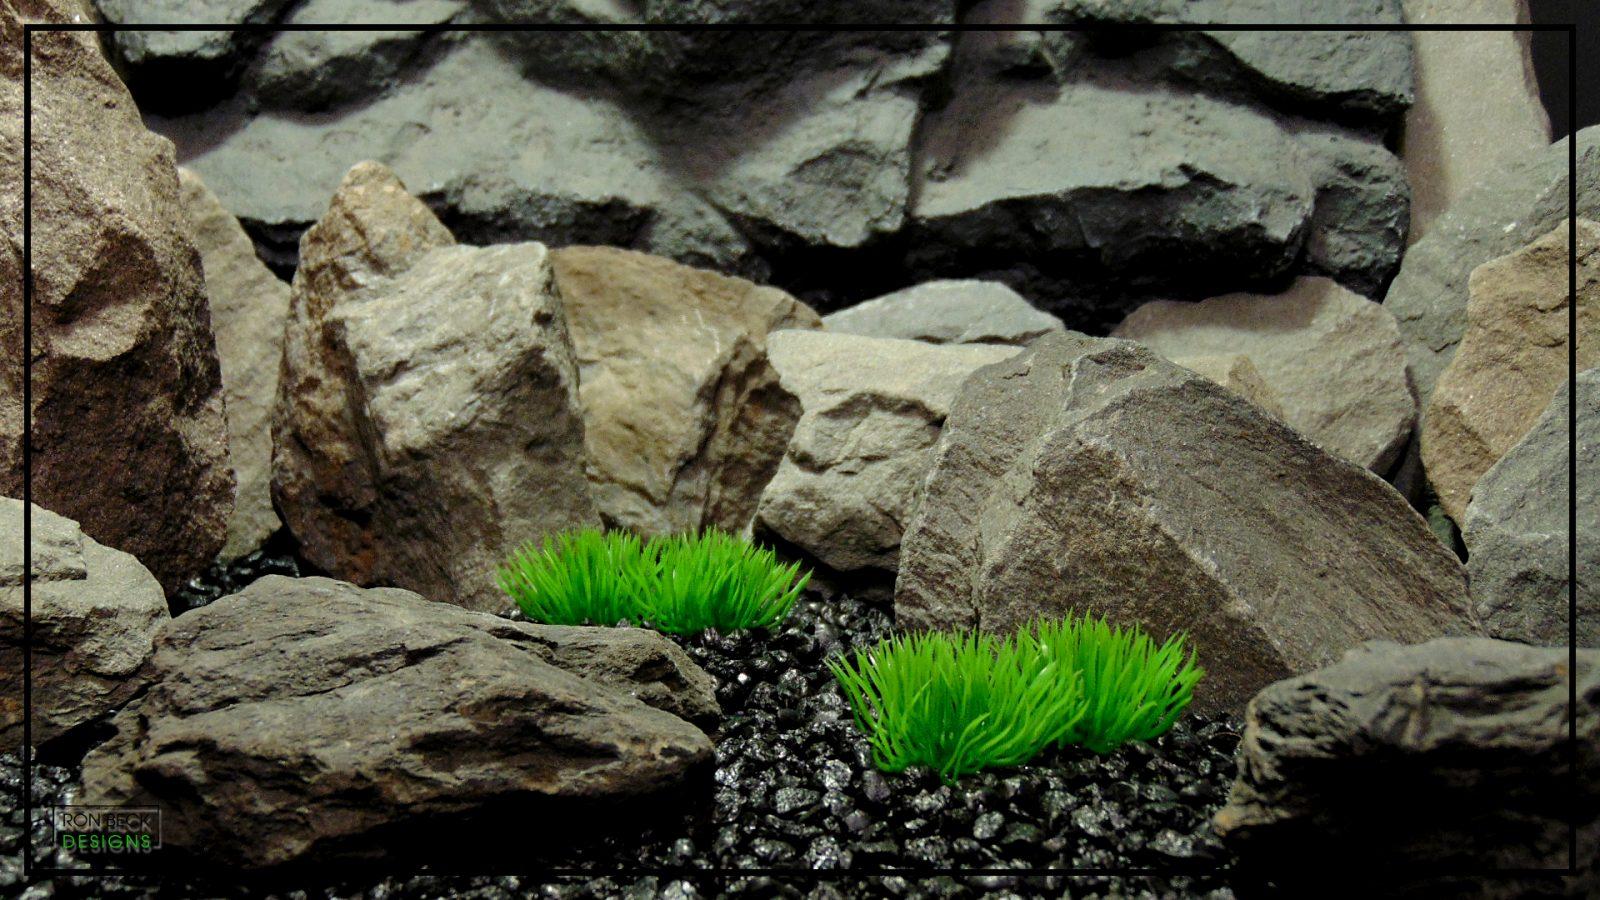 Artificial Aquarium Plant - Moss Grass Soft Touch - parp422